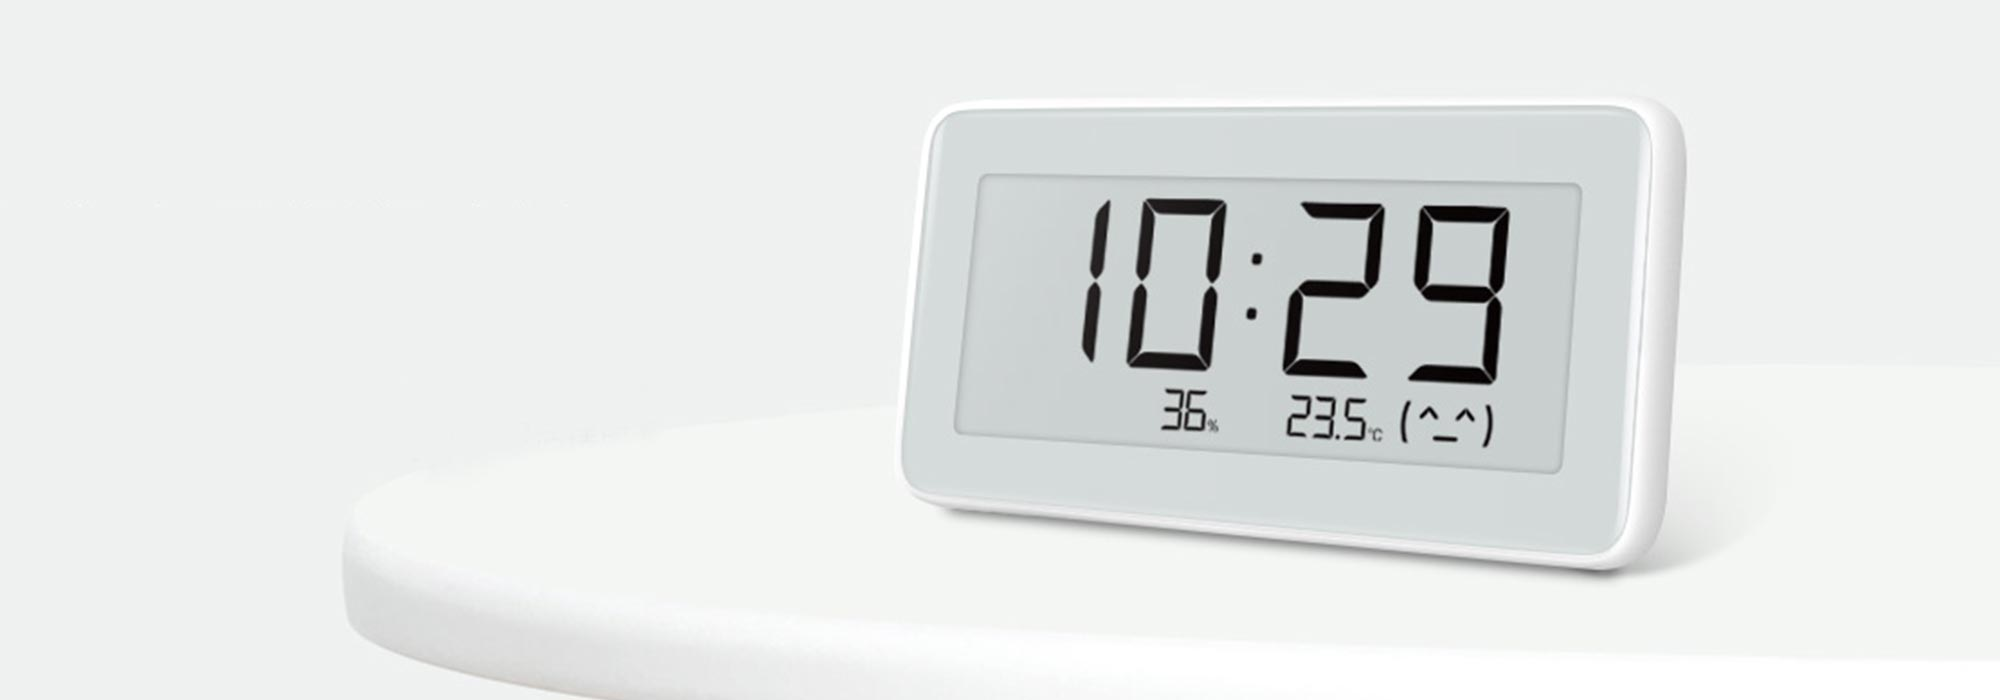 Im Test: Xiaomi Mijia Smart Hygrometer Clock